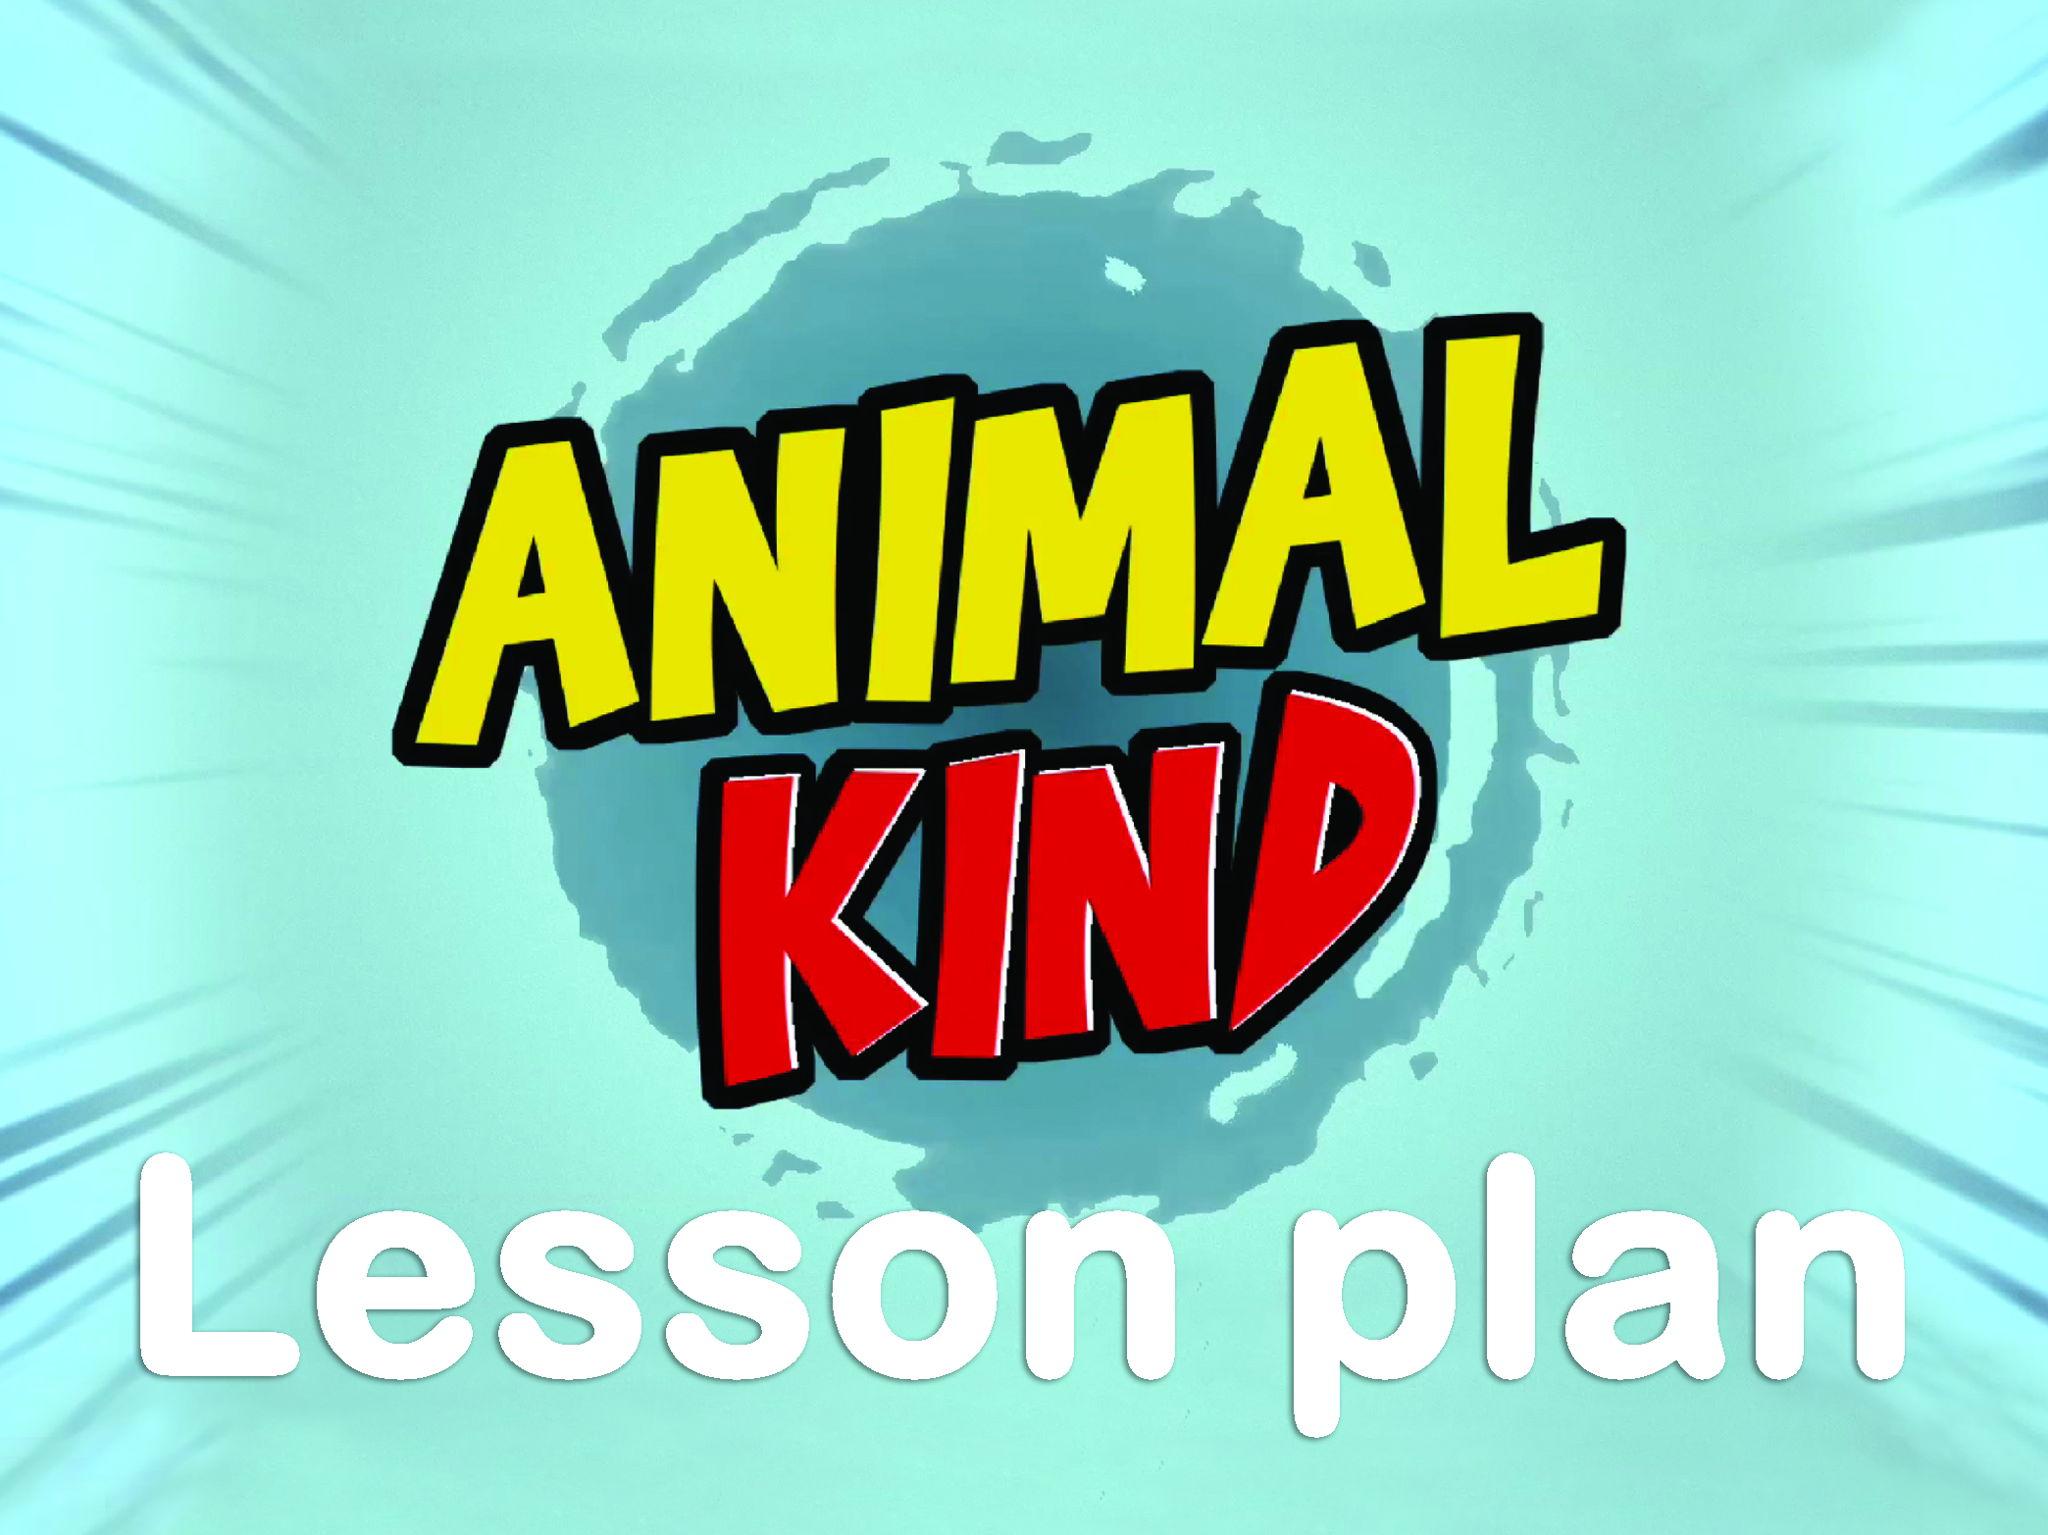 AnimalKind lesson plan 1: Who am I?